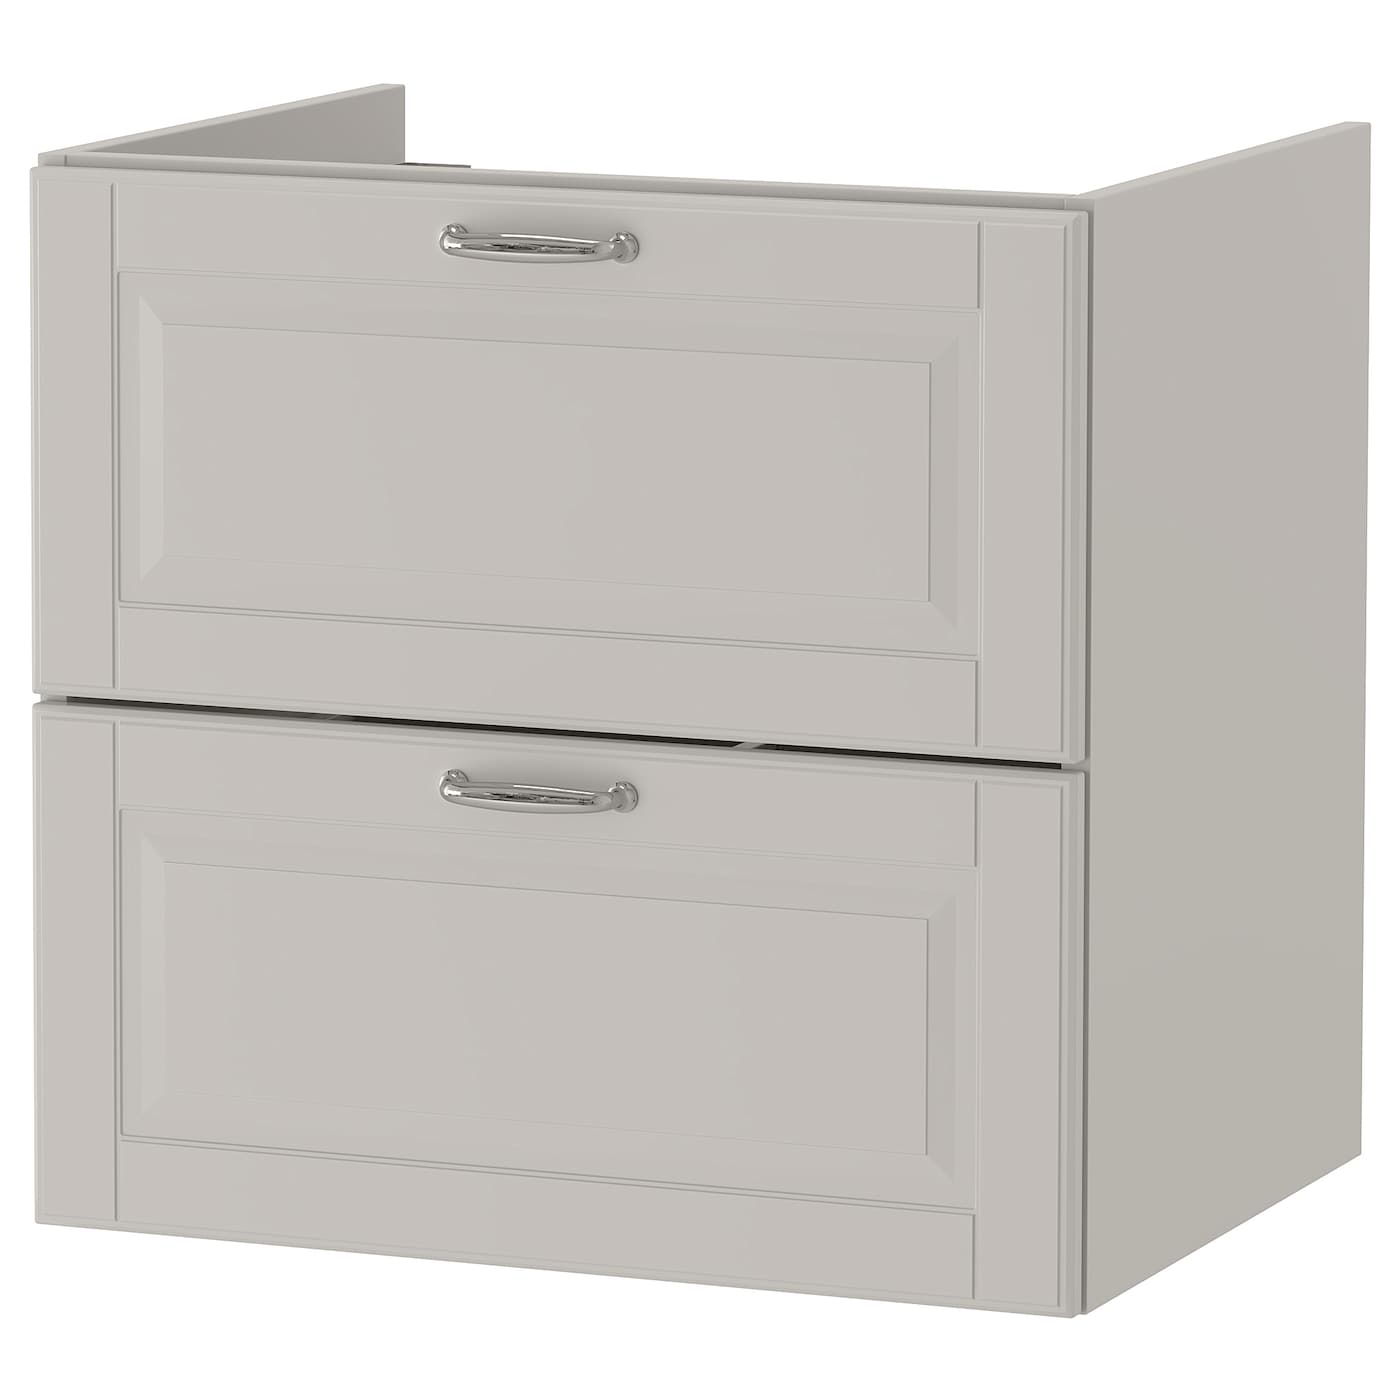 godmorgon wash stand with 2 drawers kasj n light grey 60x47x58 cm ikea. Black Bedroom Furniture Sets. Home Design Ideas